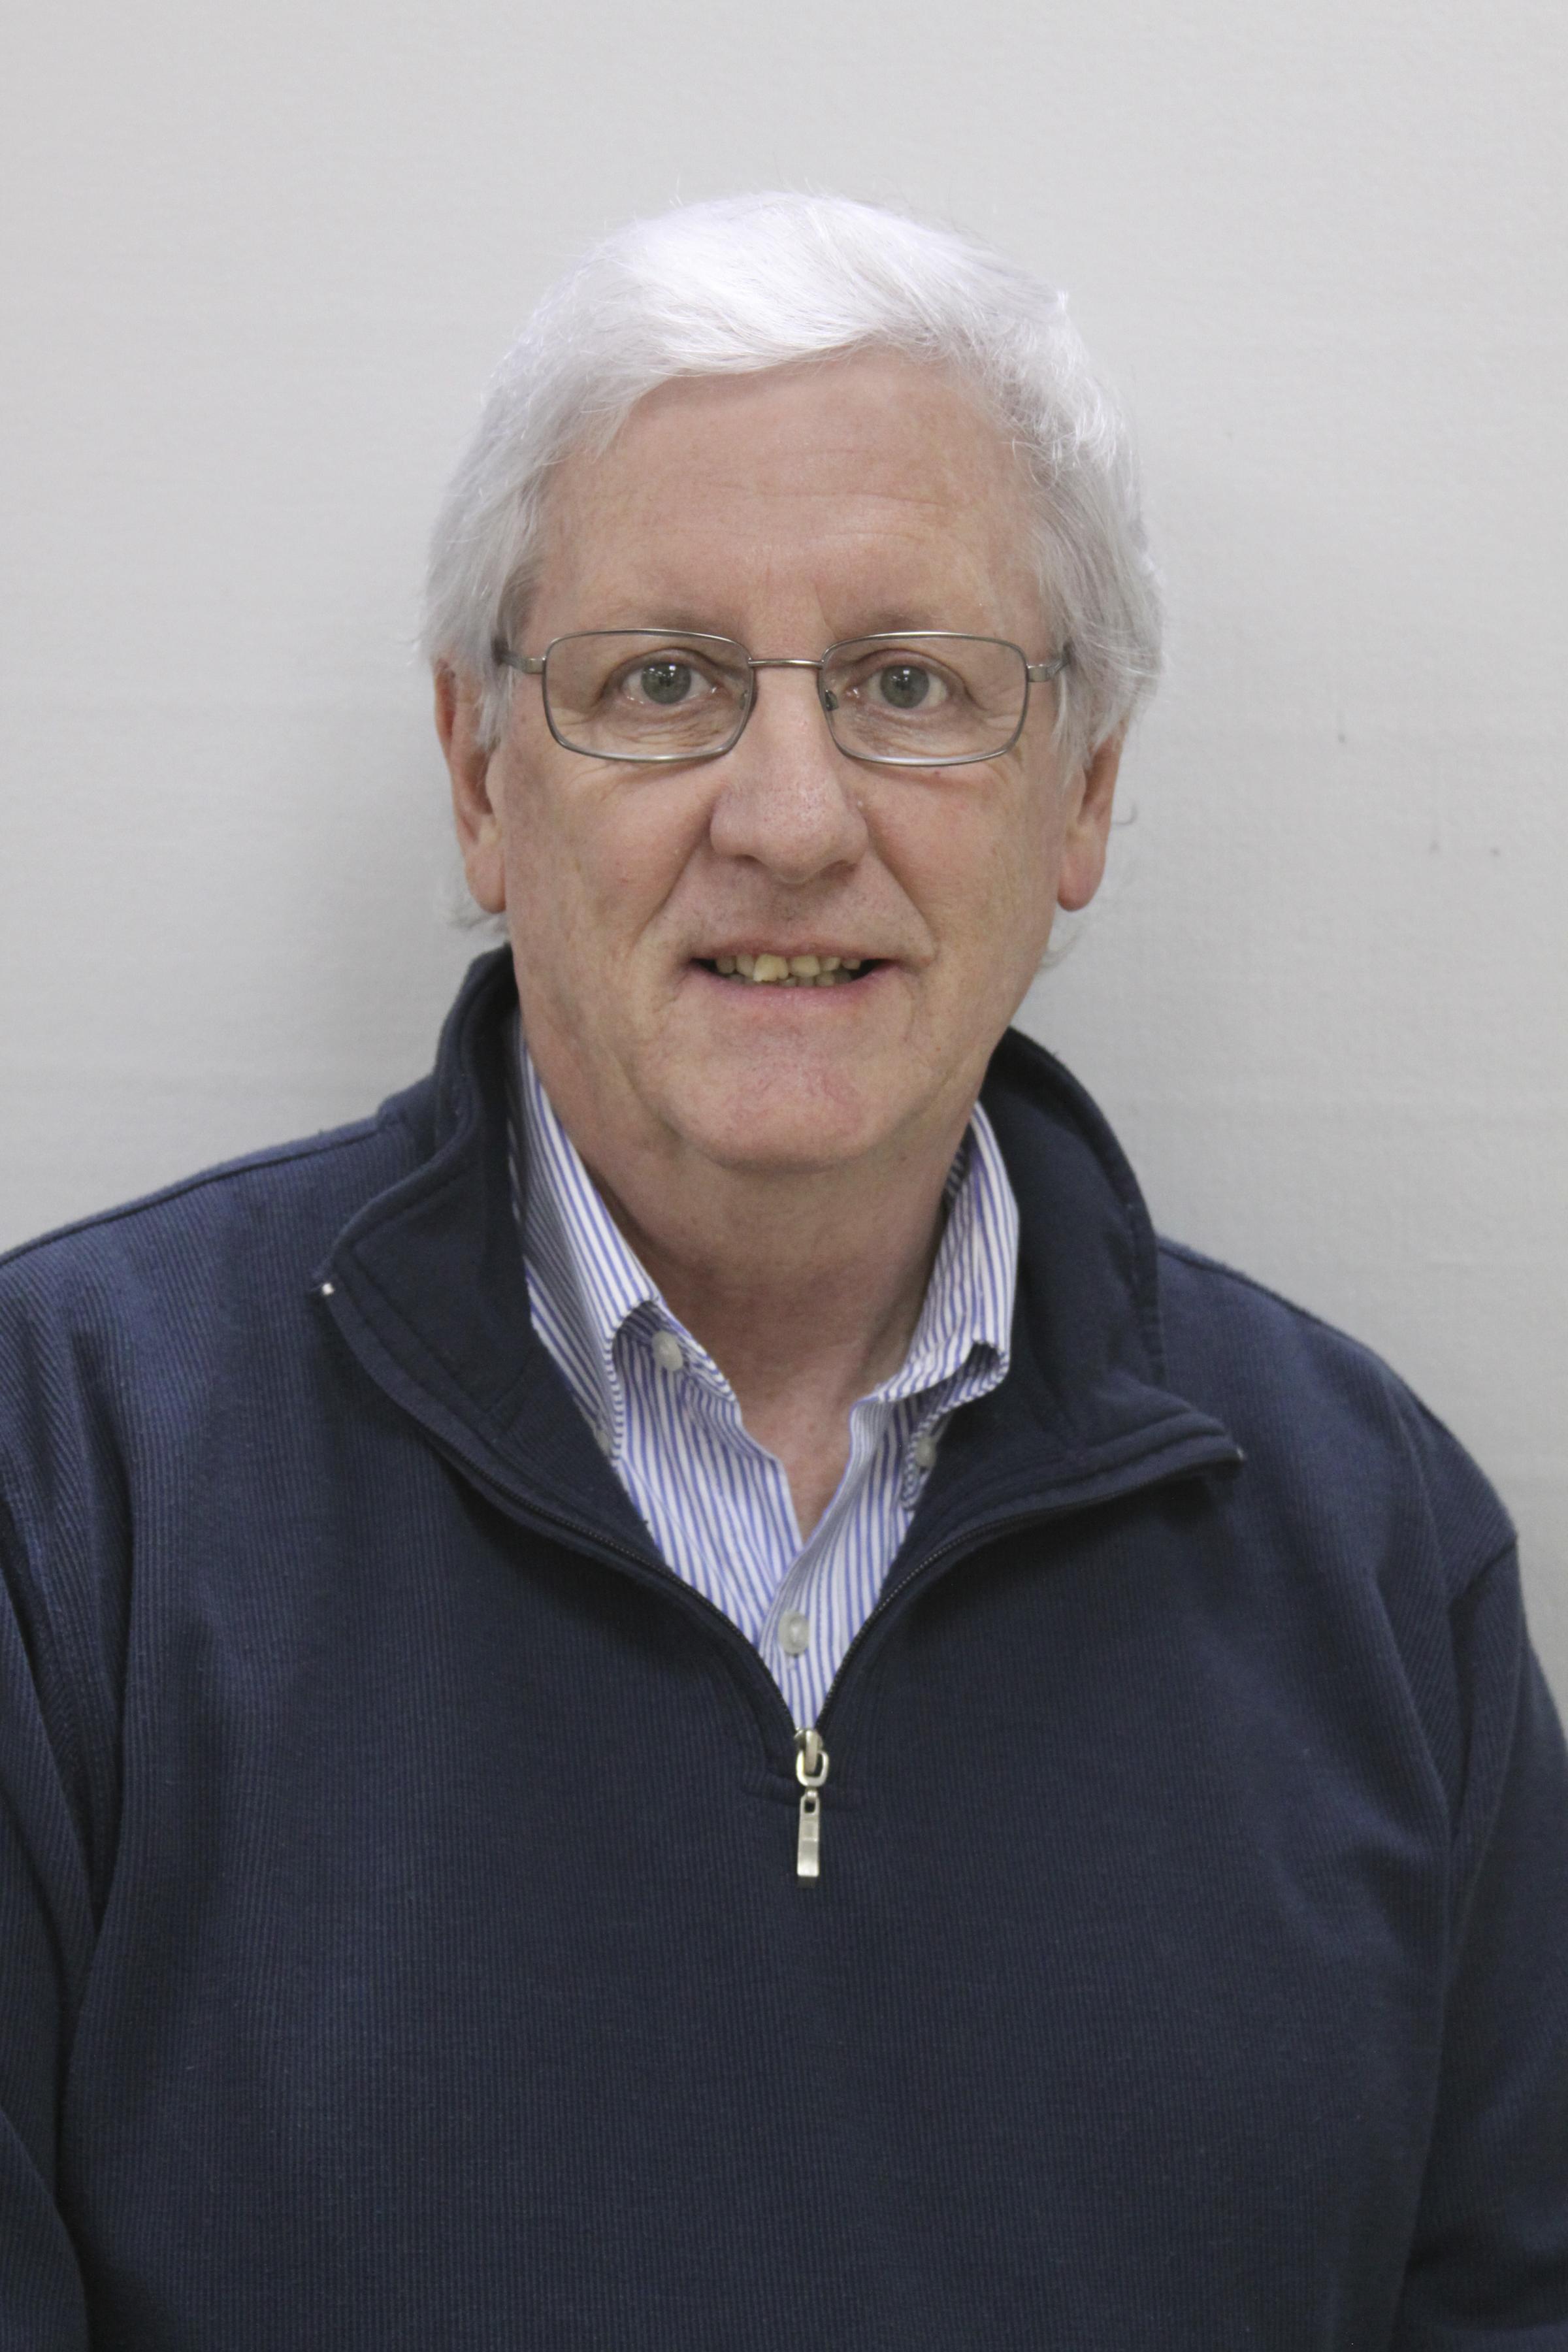 Rick Hernderson